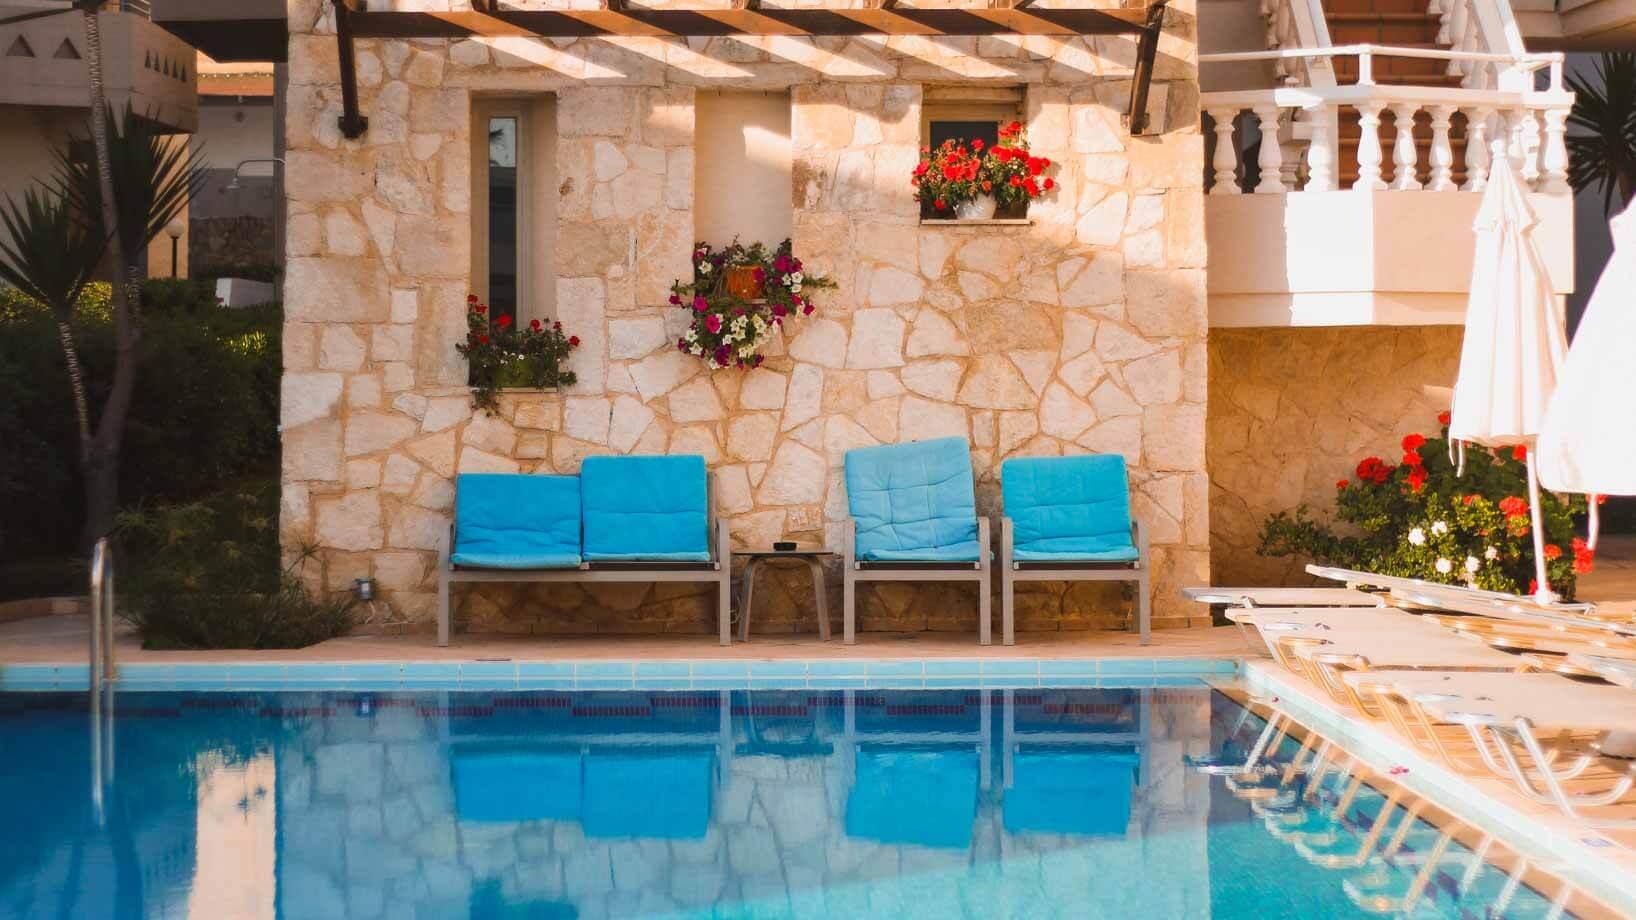 Elotis Suites. 5 Restaurants in Crete to visit on your Greek island vacation